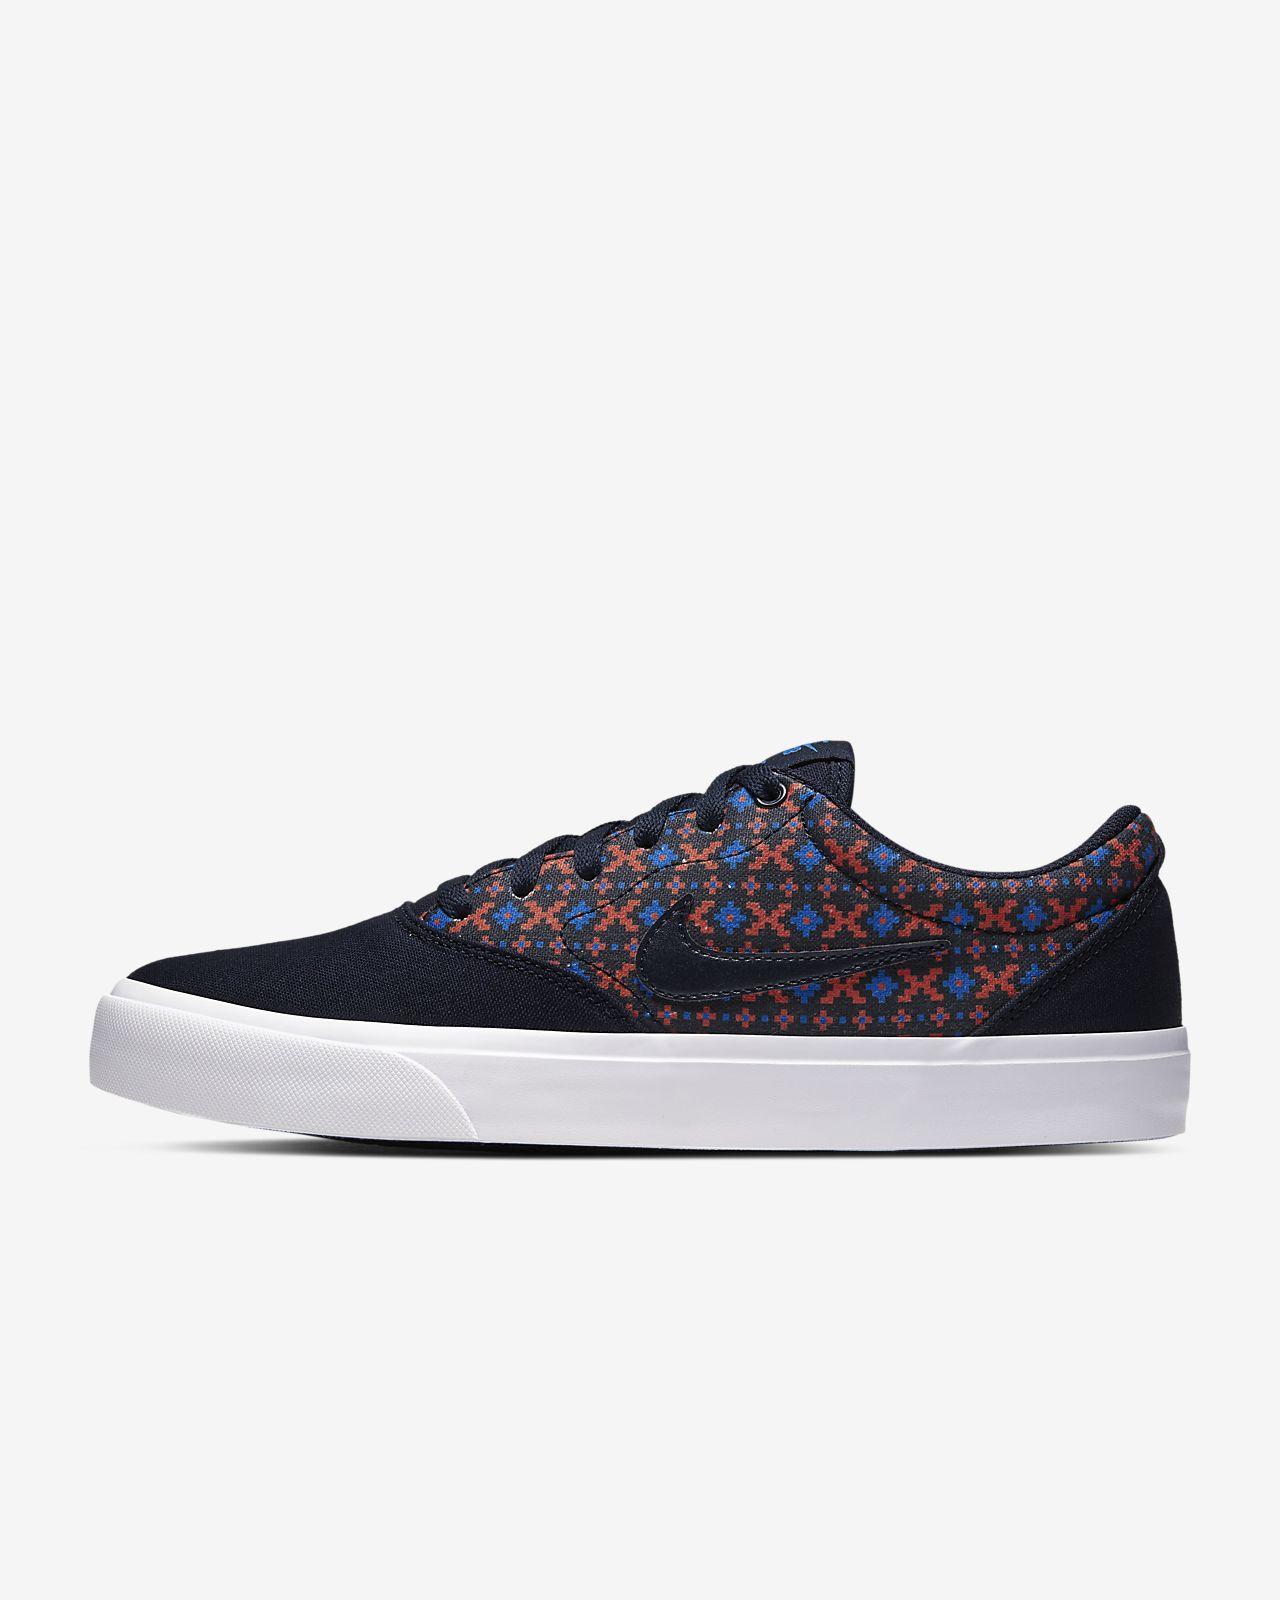 Nike SB Charge Premium Skateboardschuh